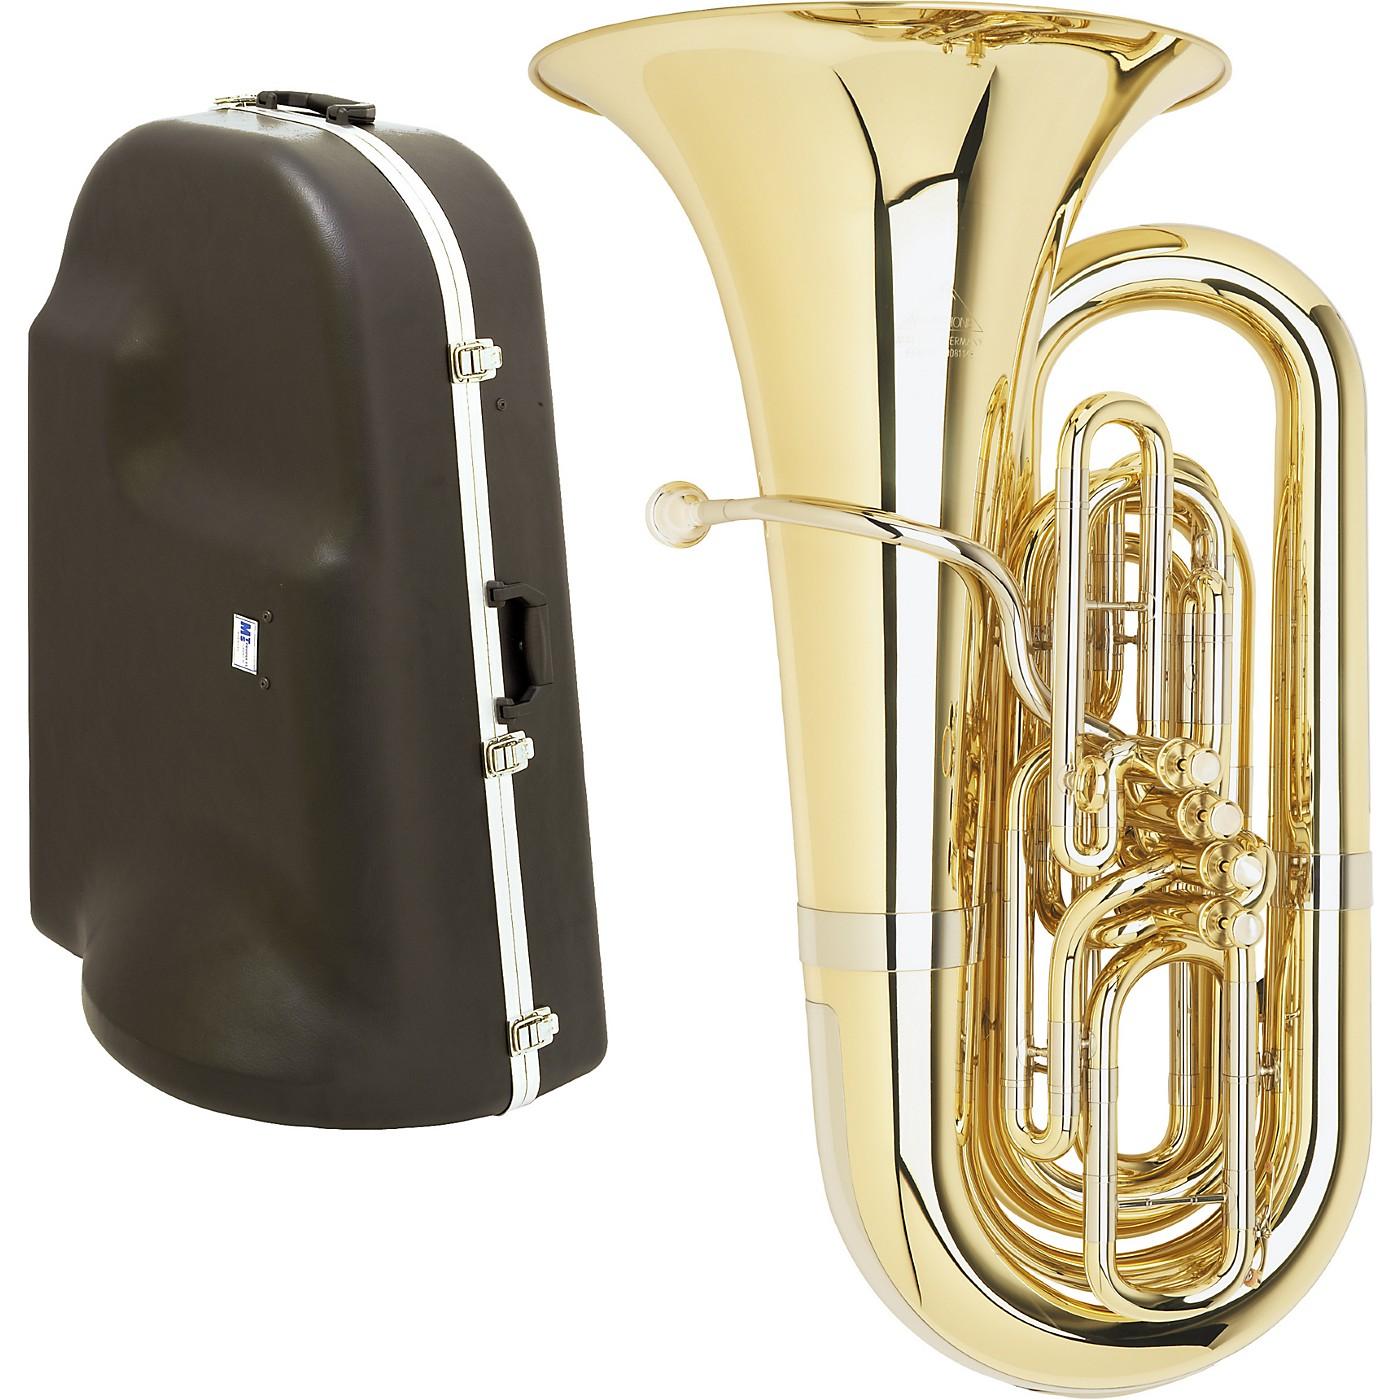 Miraphone 1291 Series 4-Valve BBb Tuba with Hard Case thumbnail